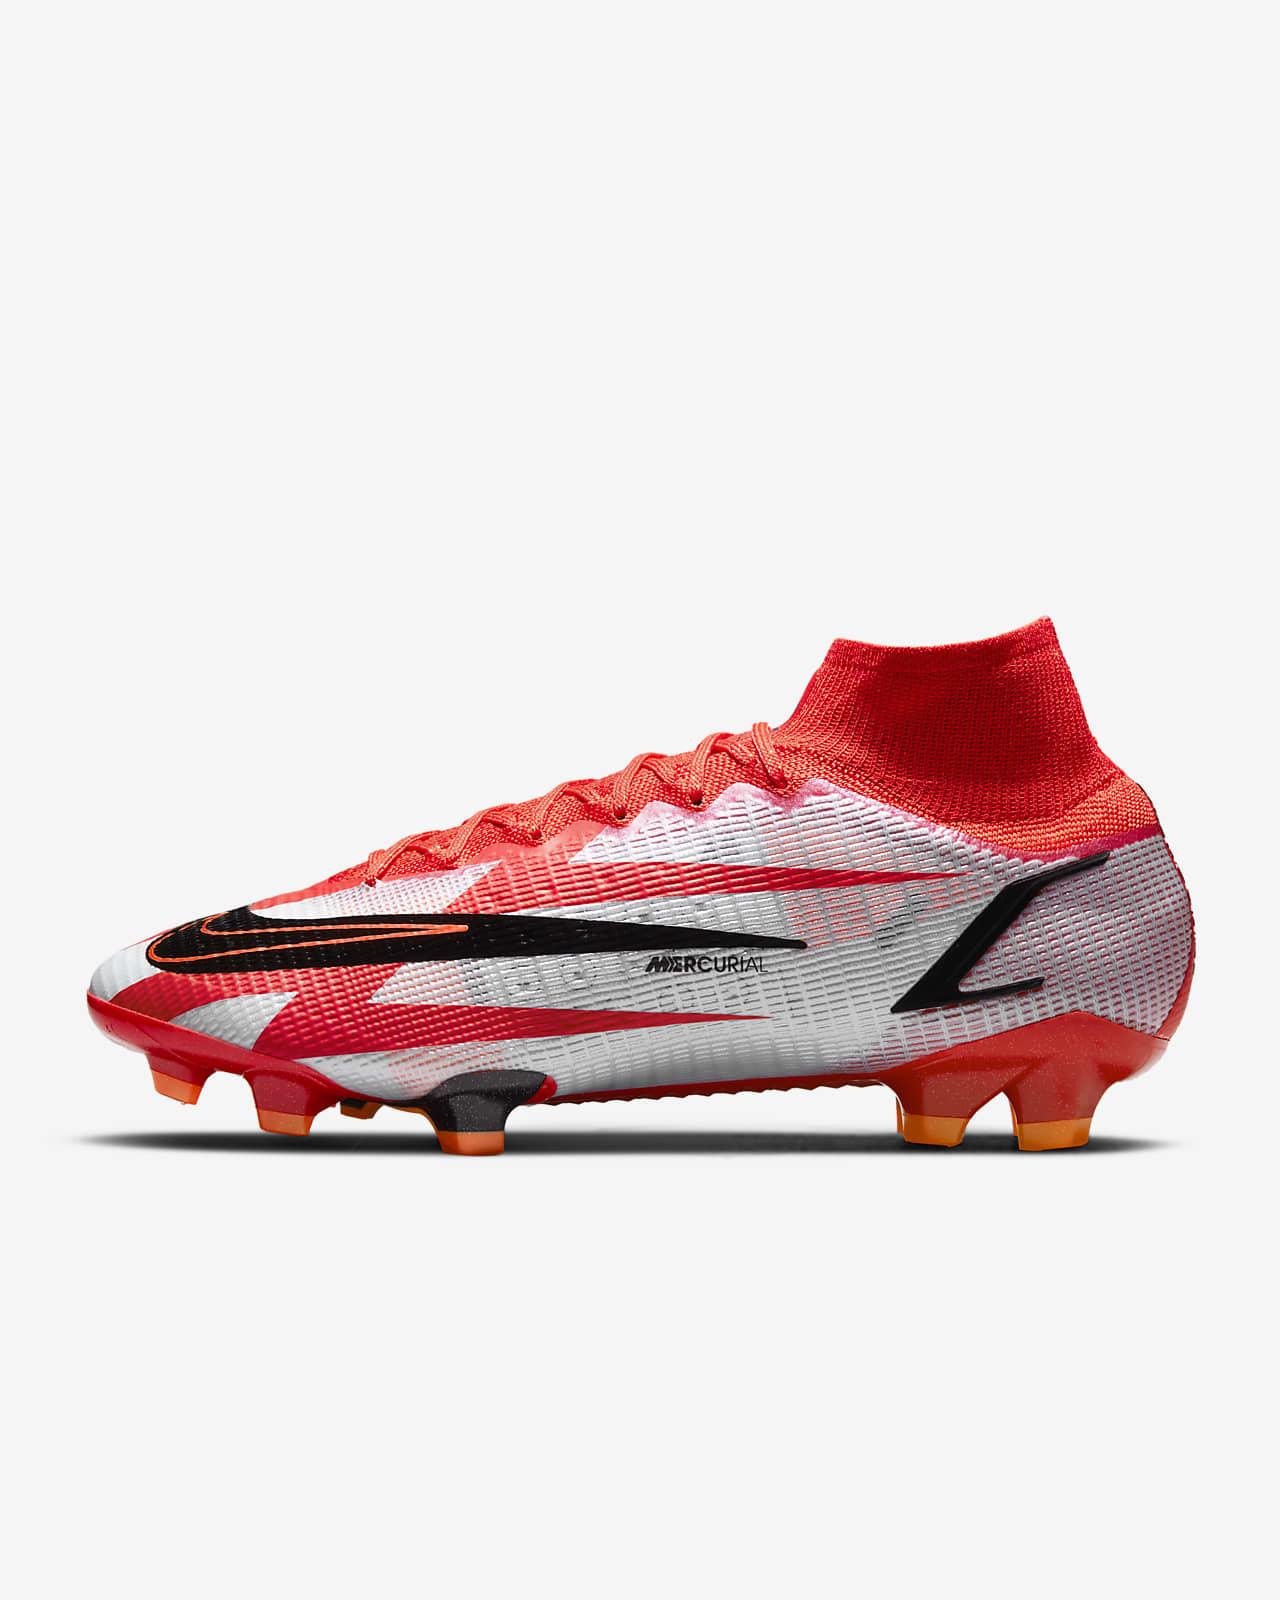 Calzado de fútbol para terreno firme Nike Mercurial Superfly 8 Elite CR7 FG